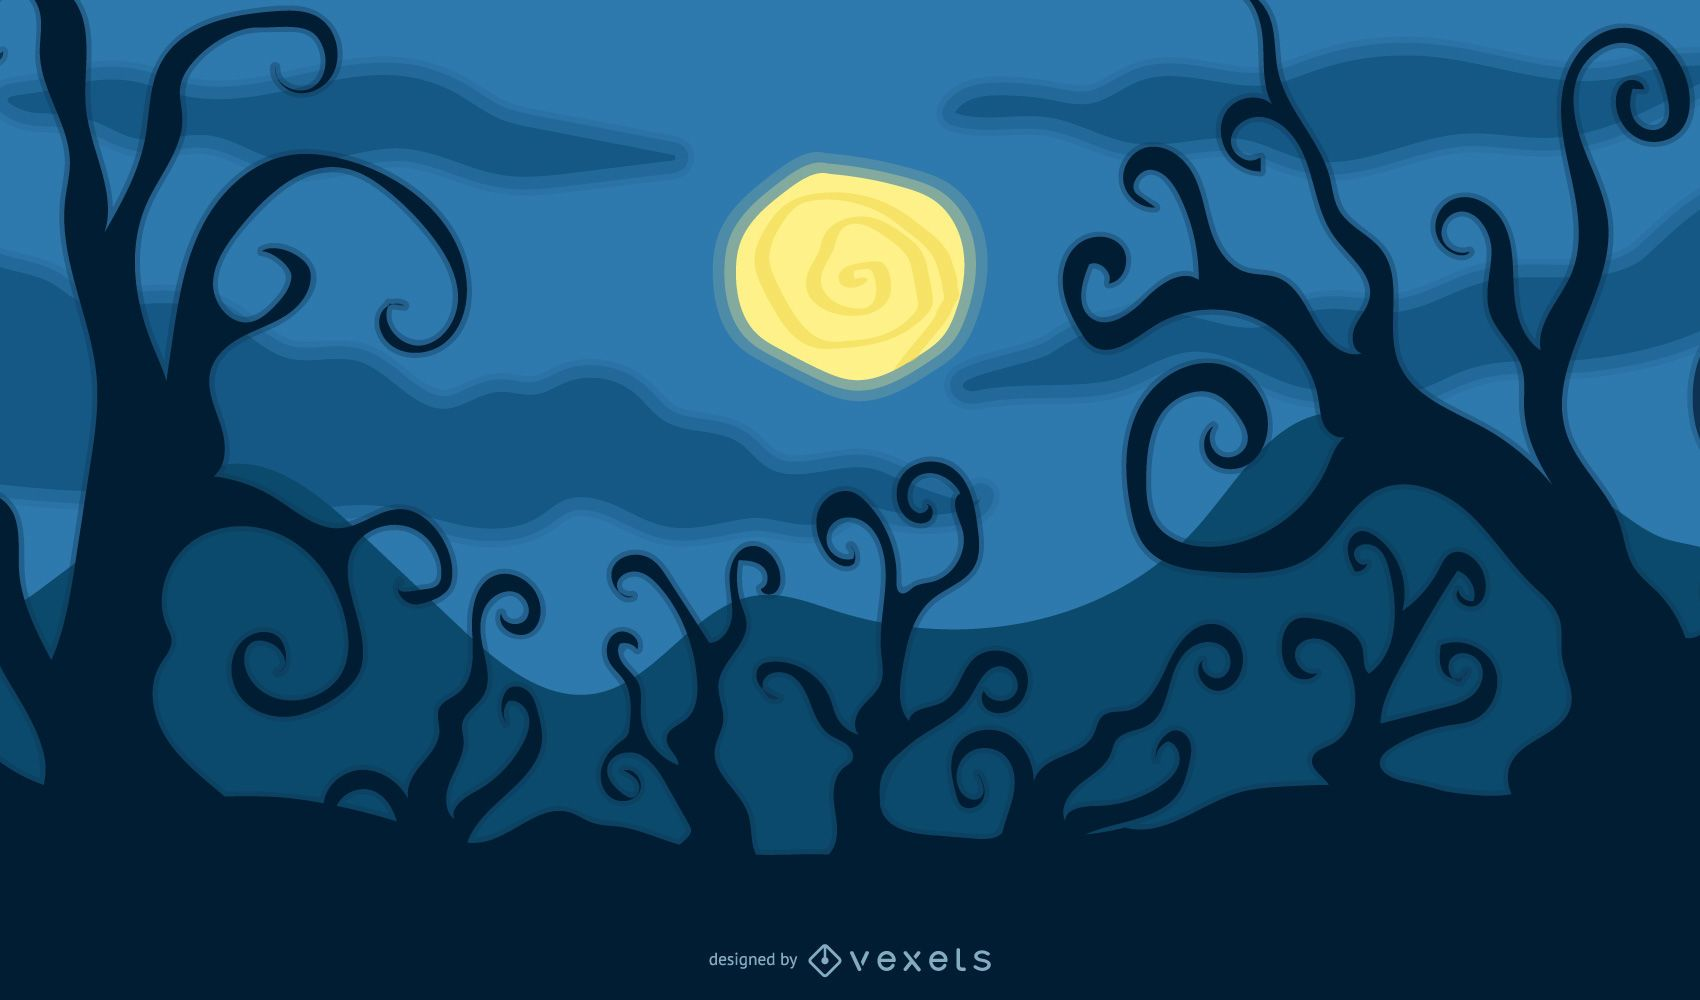 Spooky Halloween Art with Creepy Trees